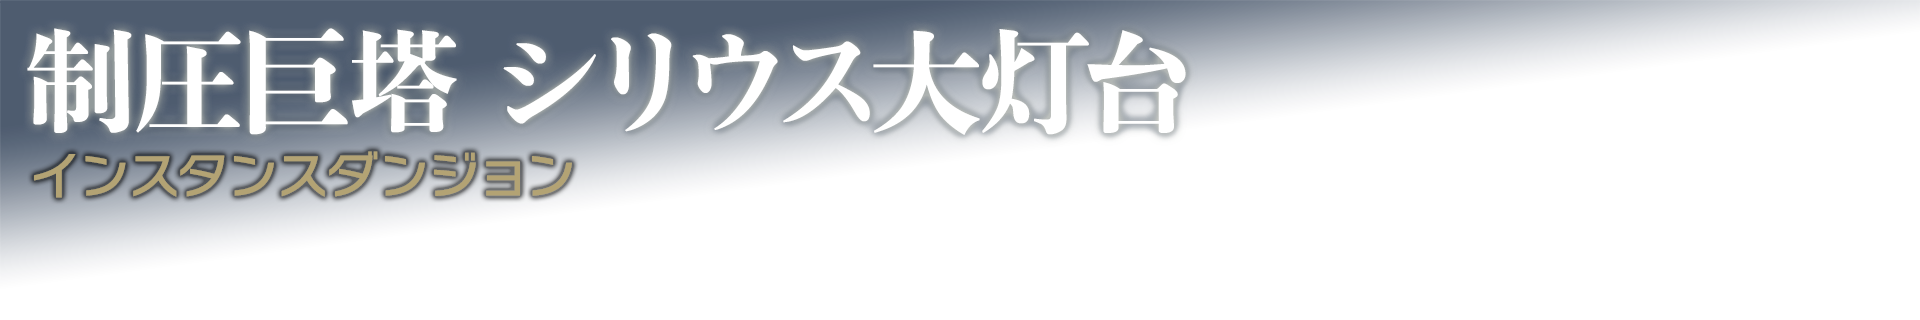 3_1_0_ctitle03_02_01